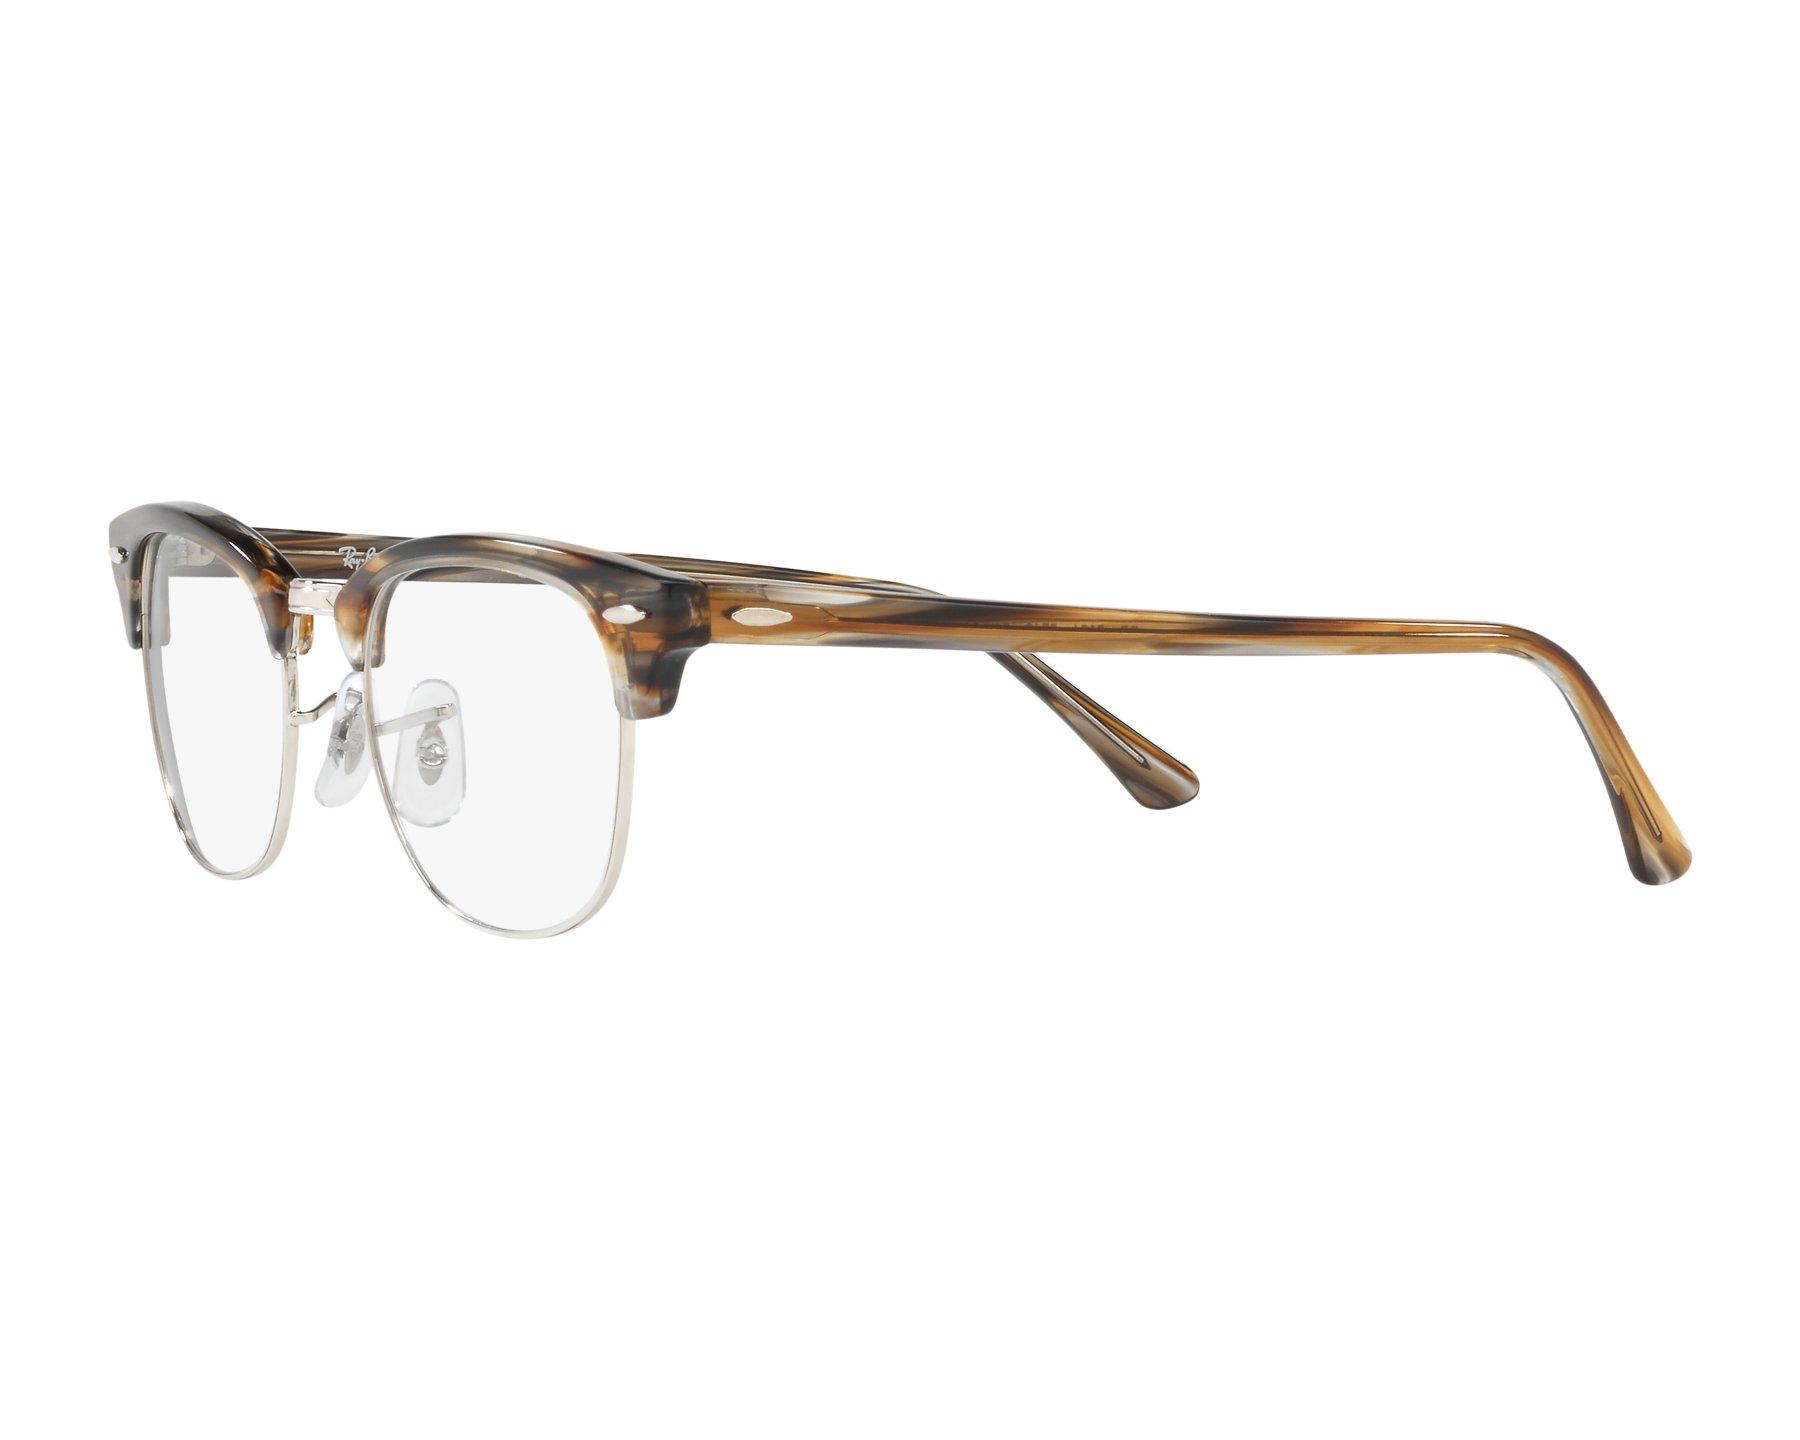 5ca42cda744 eyeglasses Ray-Ban RX-5154 5749 49-21 Brown Silver 360 degree view